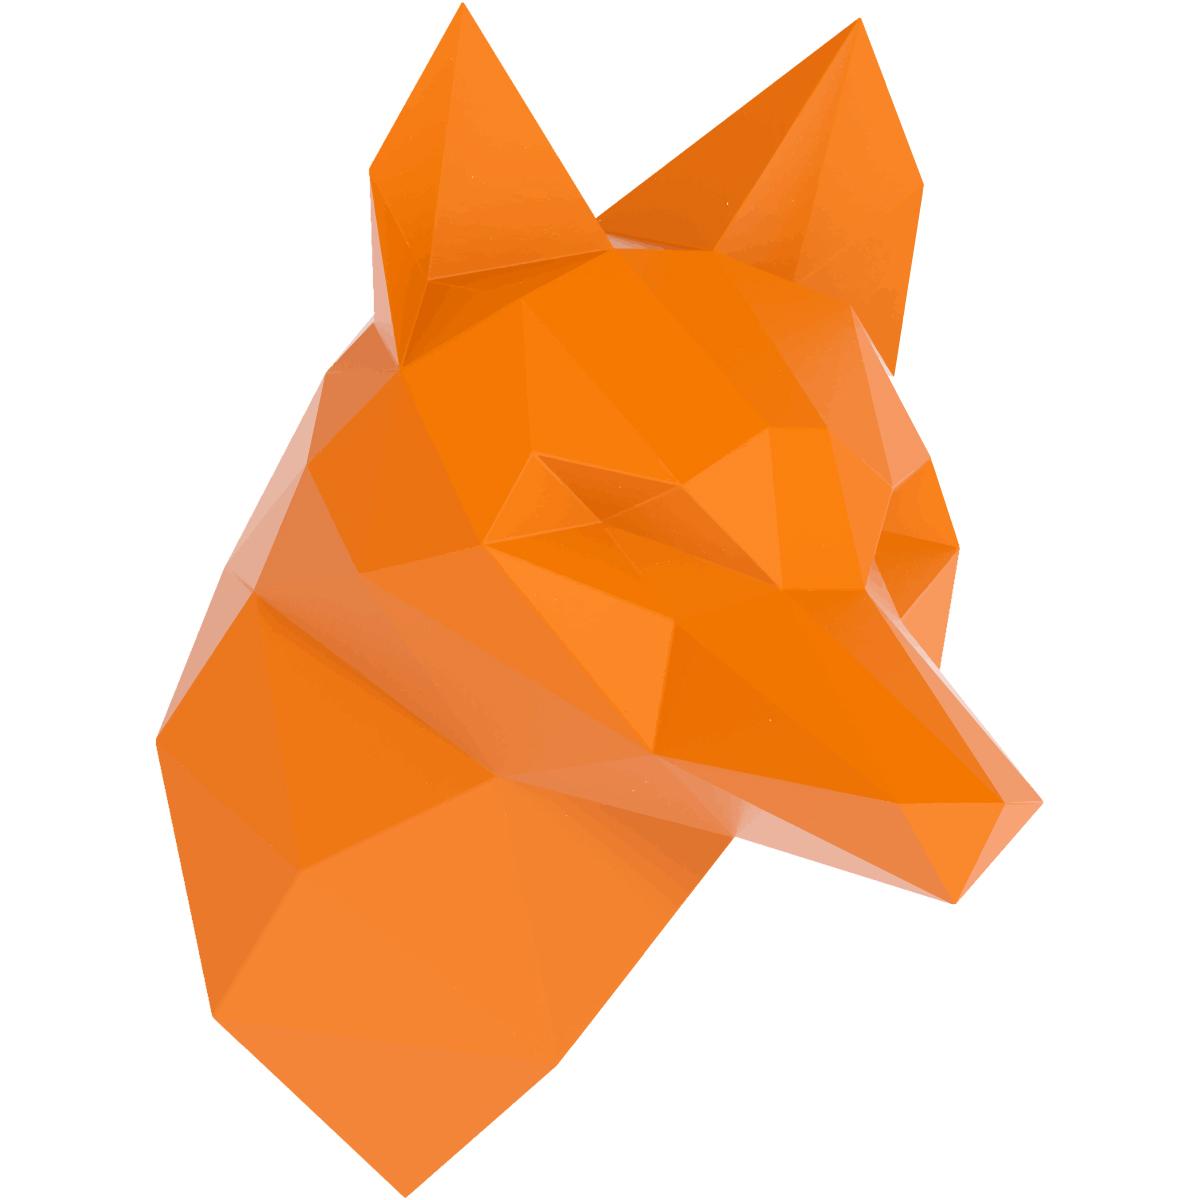 Sticker origami 3d renard orange de profil stickers 3d effets 3d ambiance sticker - Animaux origami 3d ...